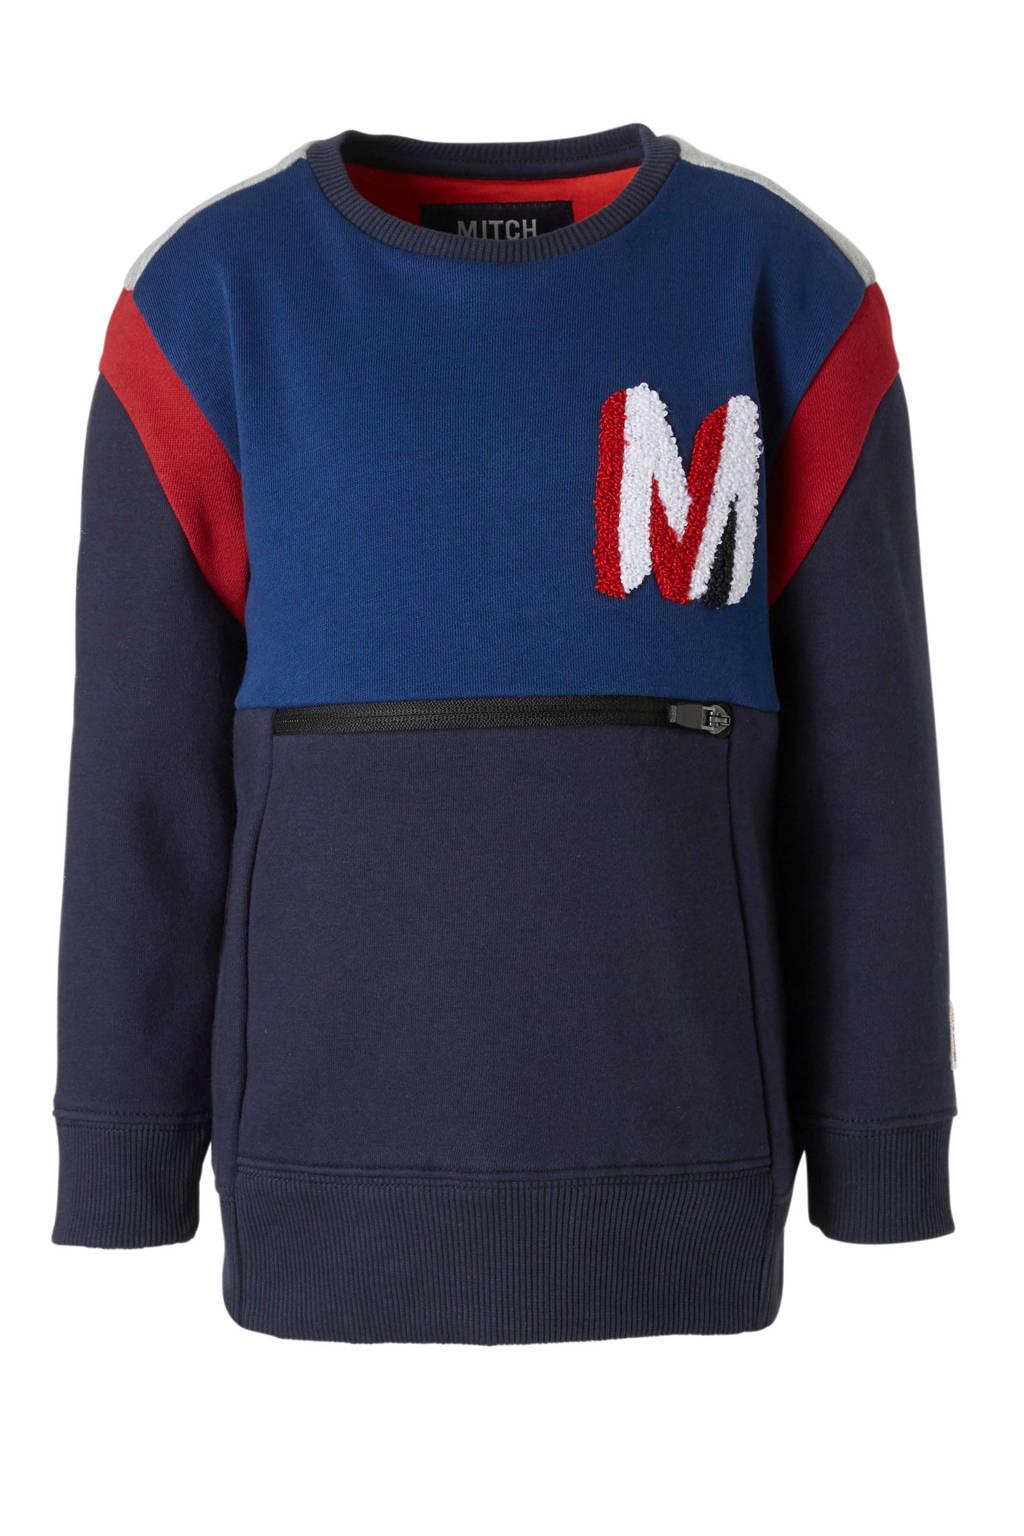 Mitch sweater Fayan blauw, Blauw/rood/grijs